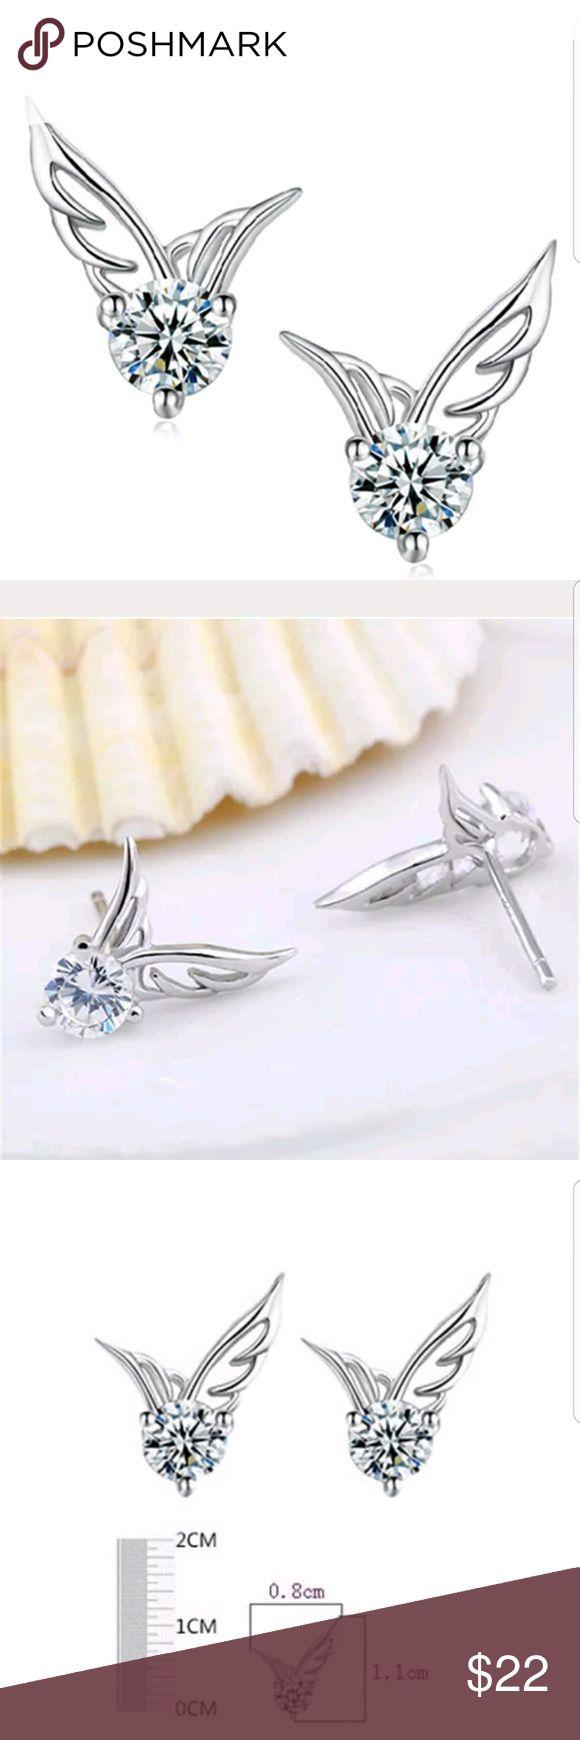 Sterling Silver Jewelry angel Wings Studs 100 Brand new.Rhinestone . Material Alloy.  Lead Free, Nickel Free. Jewelry Earrings